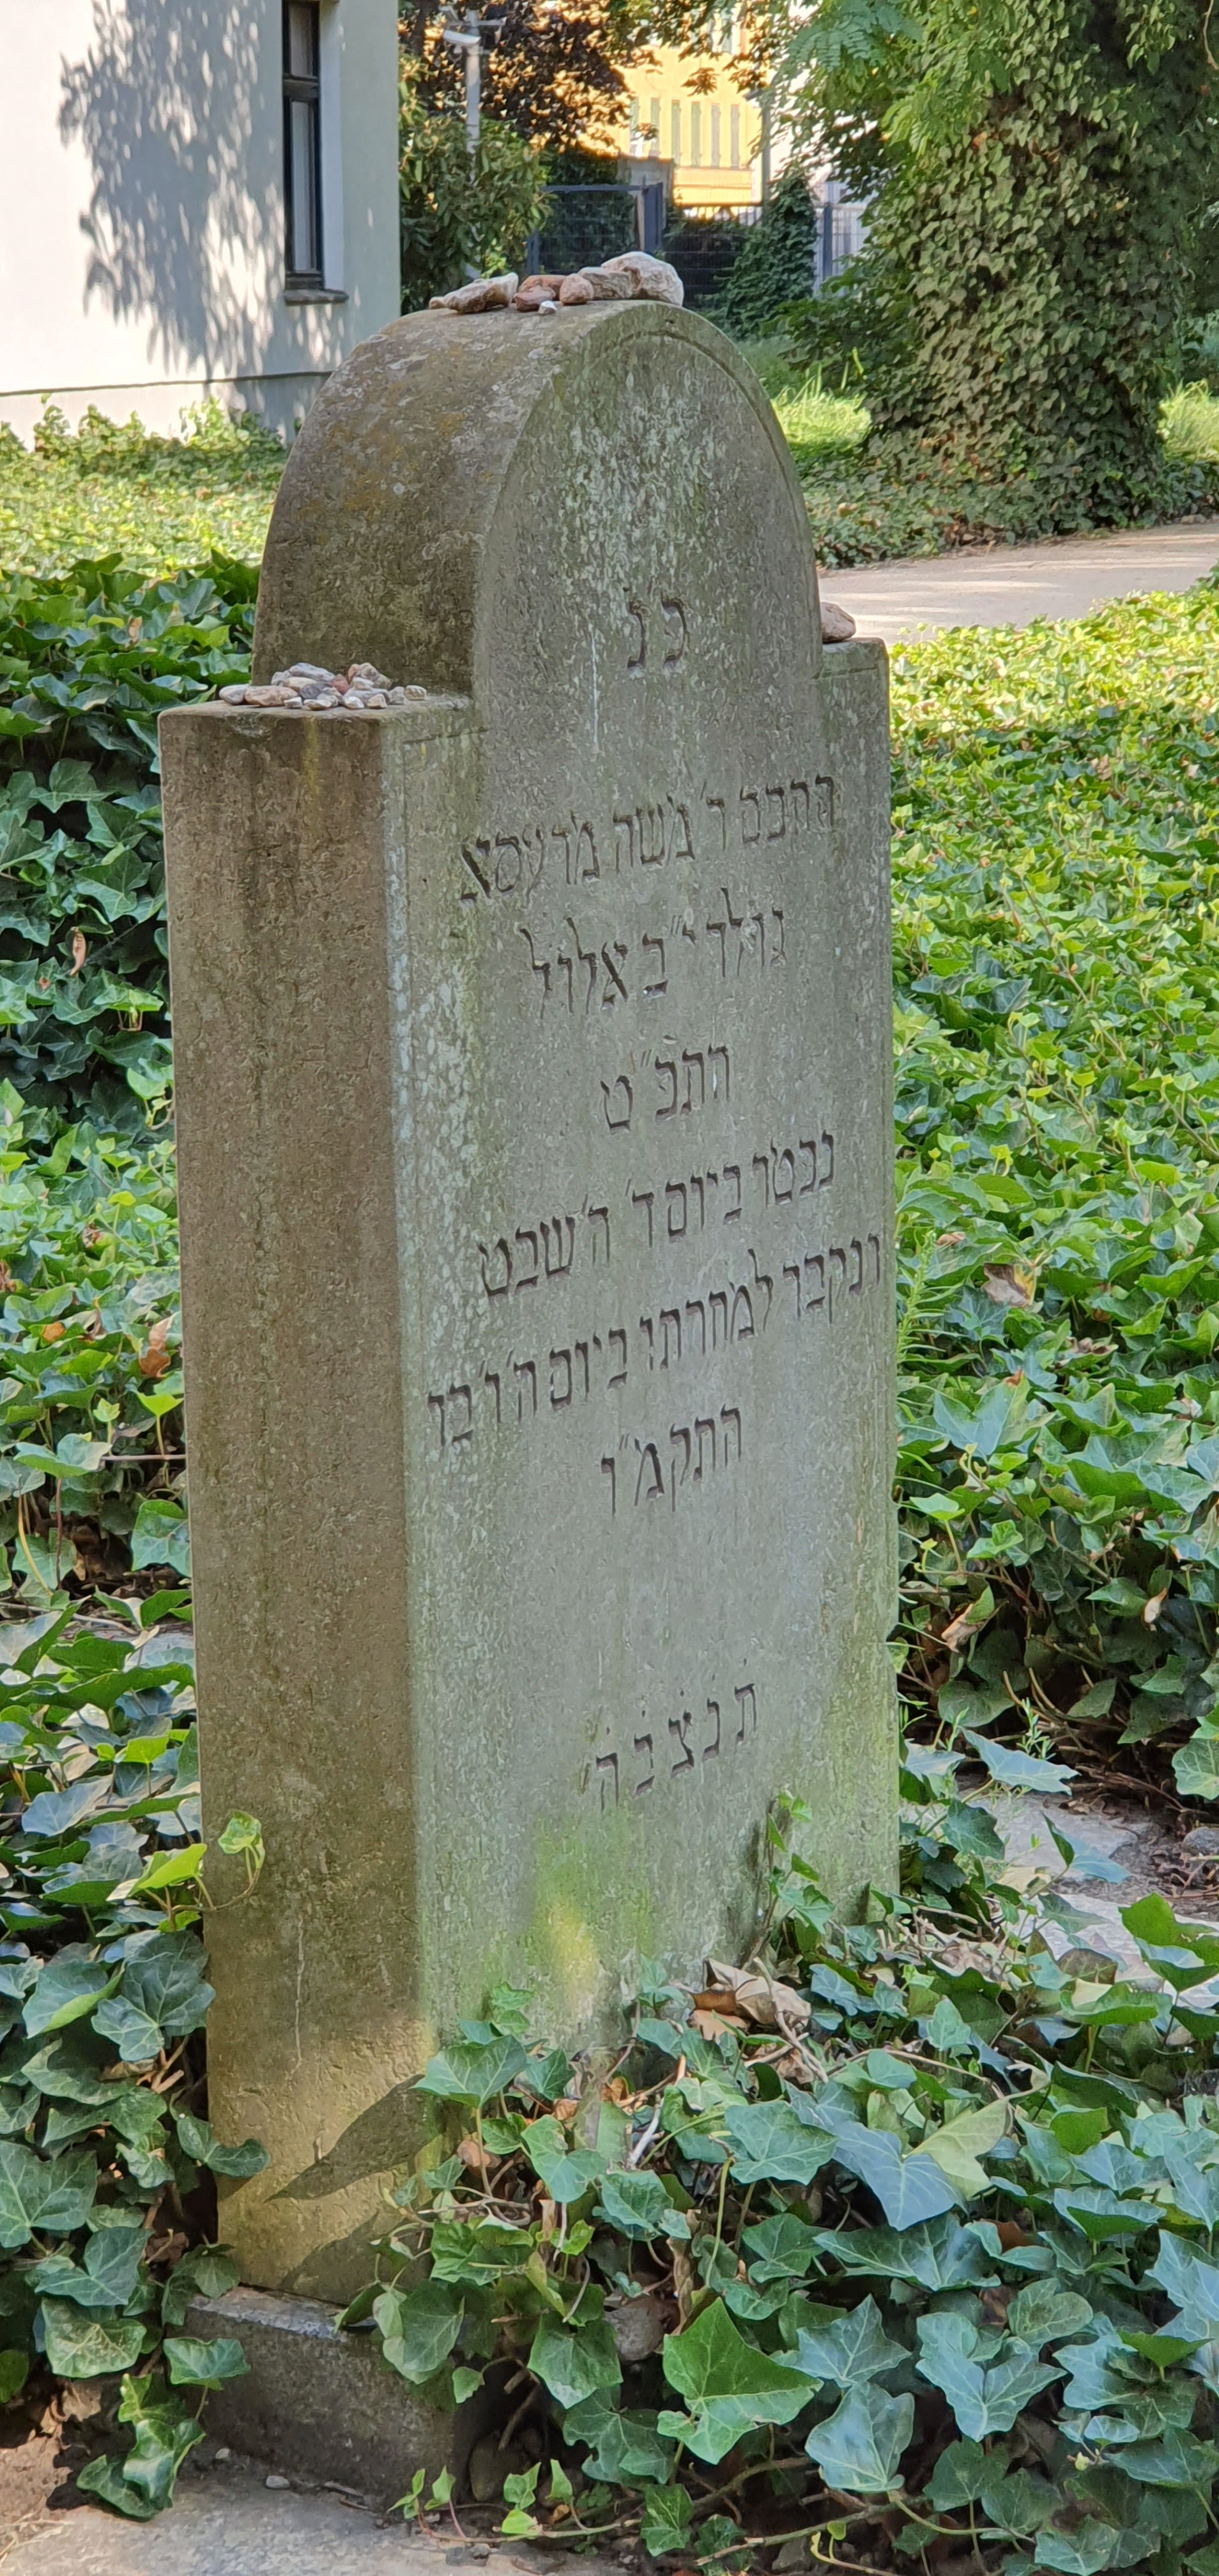 File:Grave of Moses Mendelssohn-Jewish cemetery Berlin-2.jpg